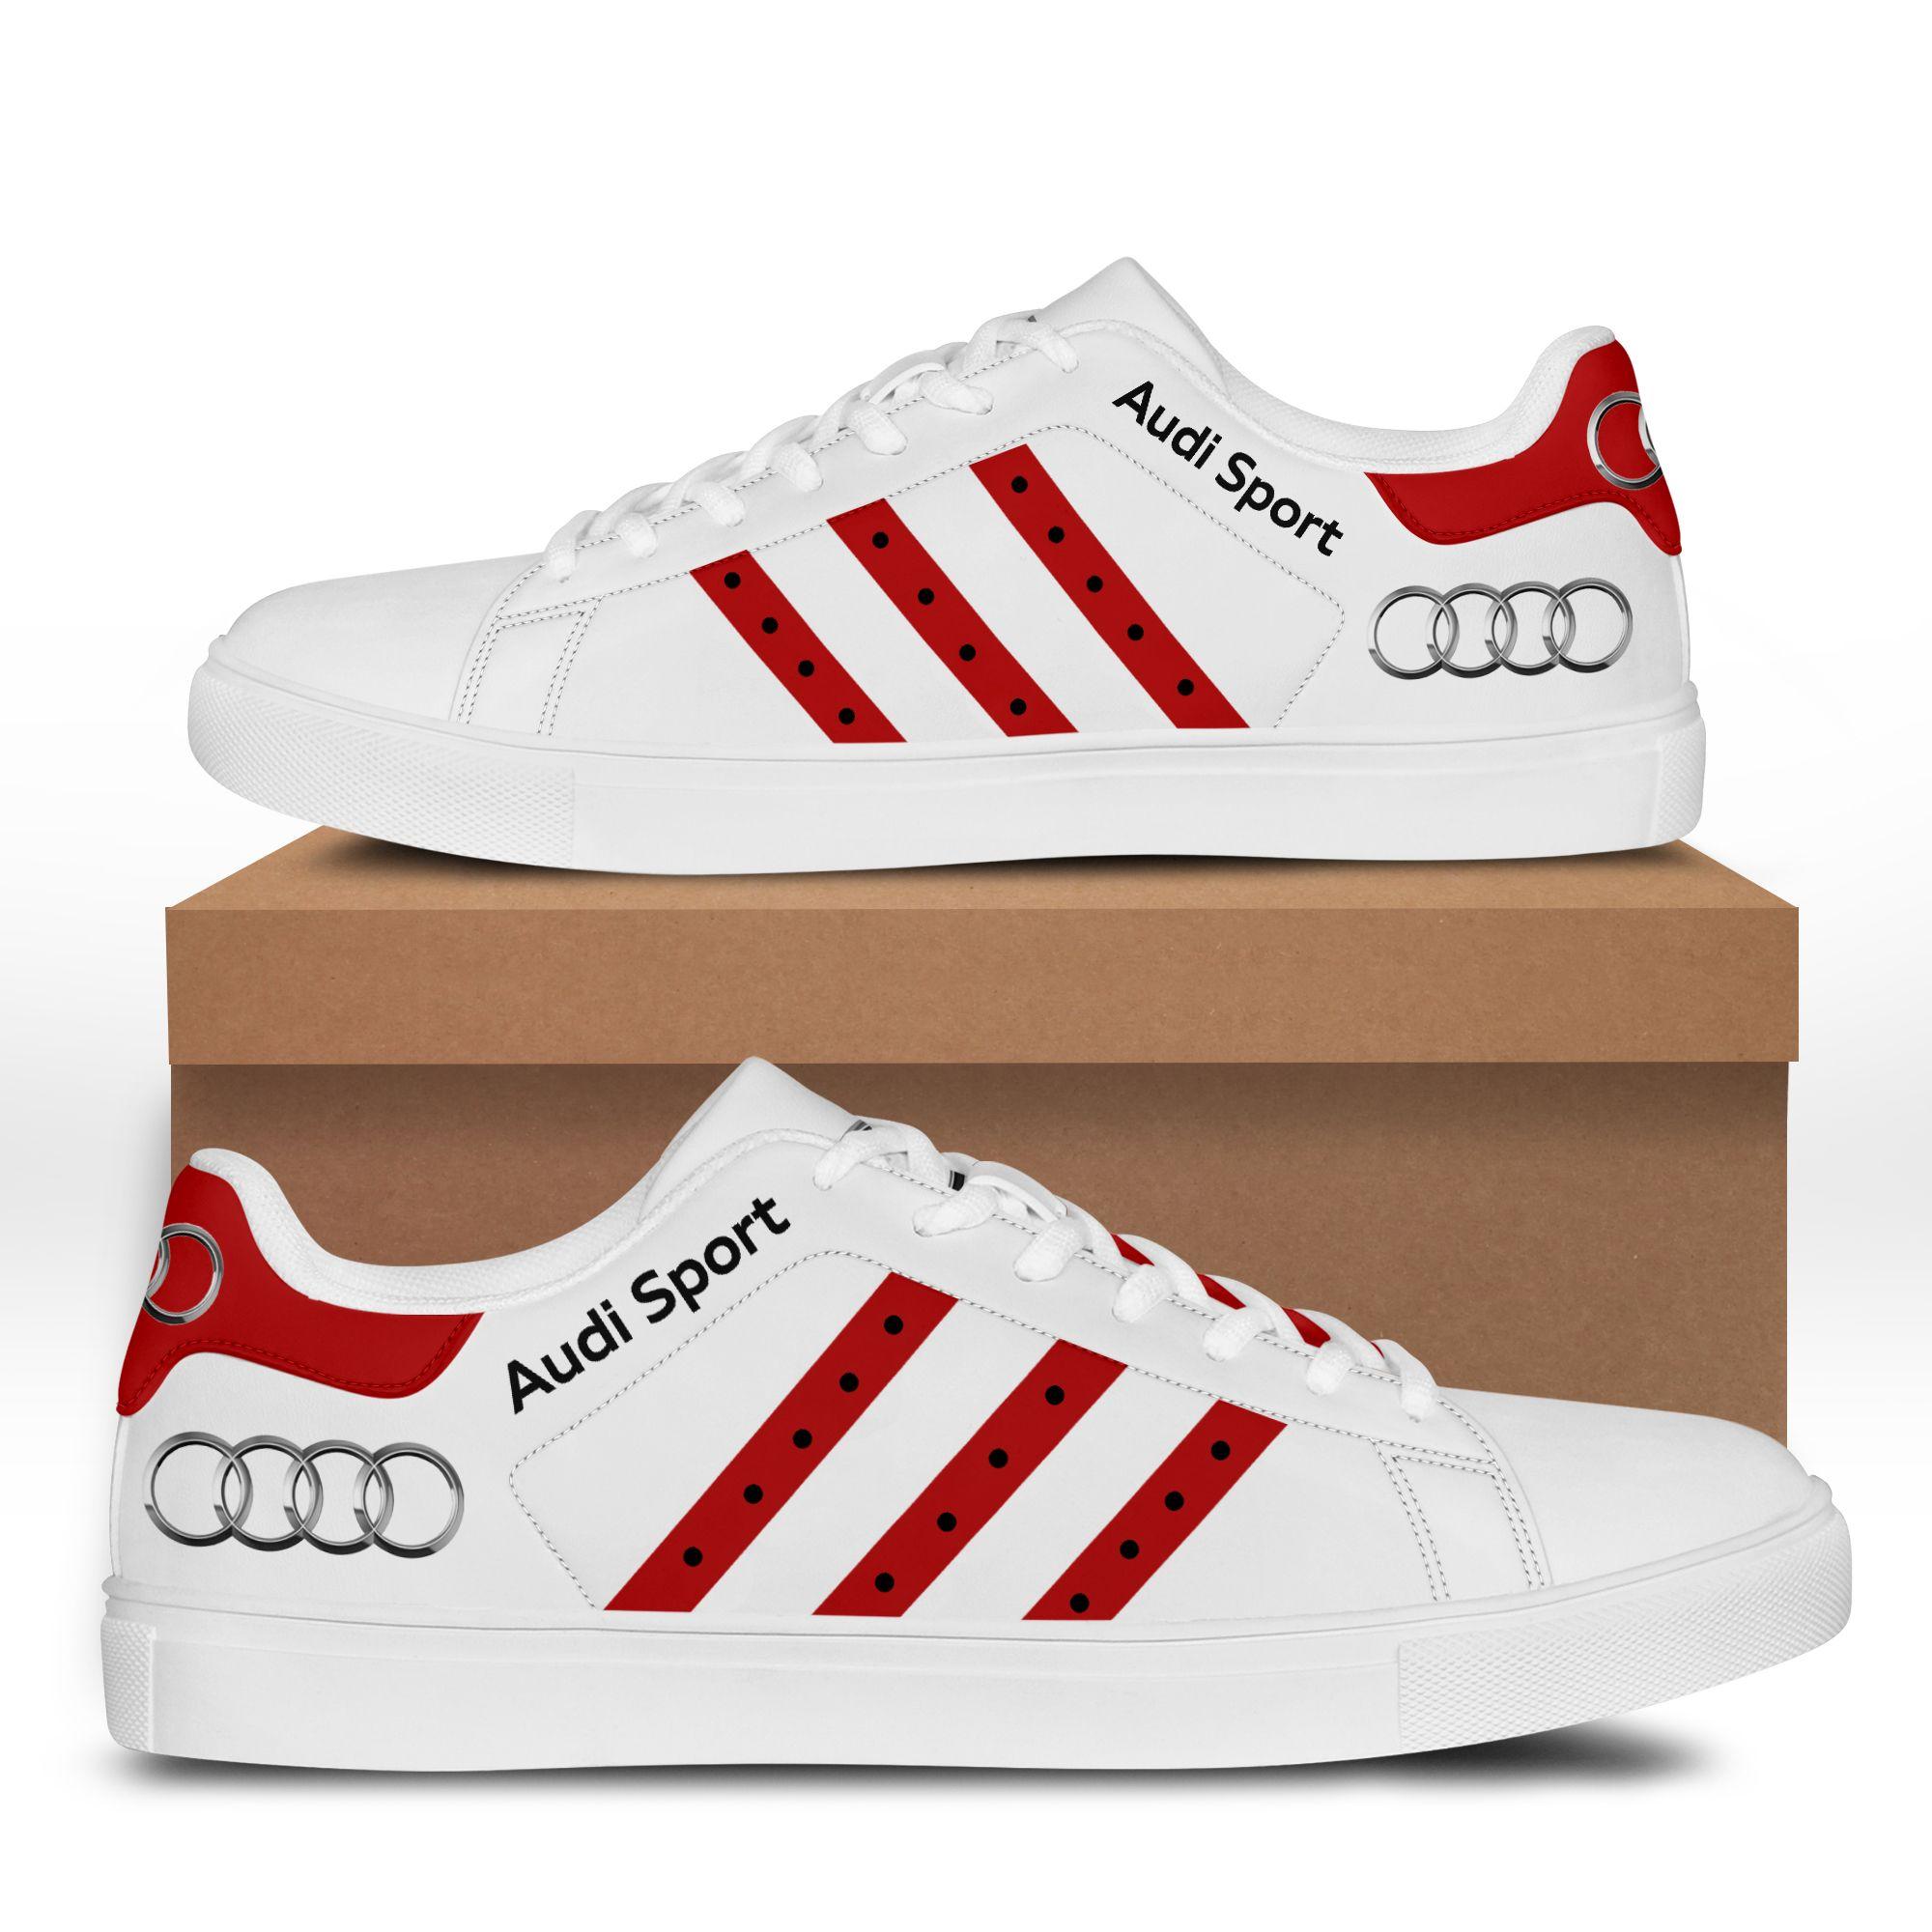 Audi Sport Premium white Smith Shoes